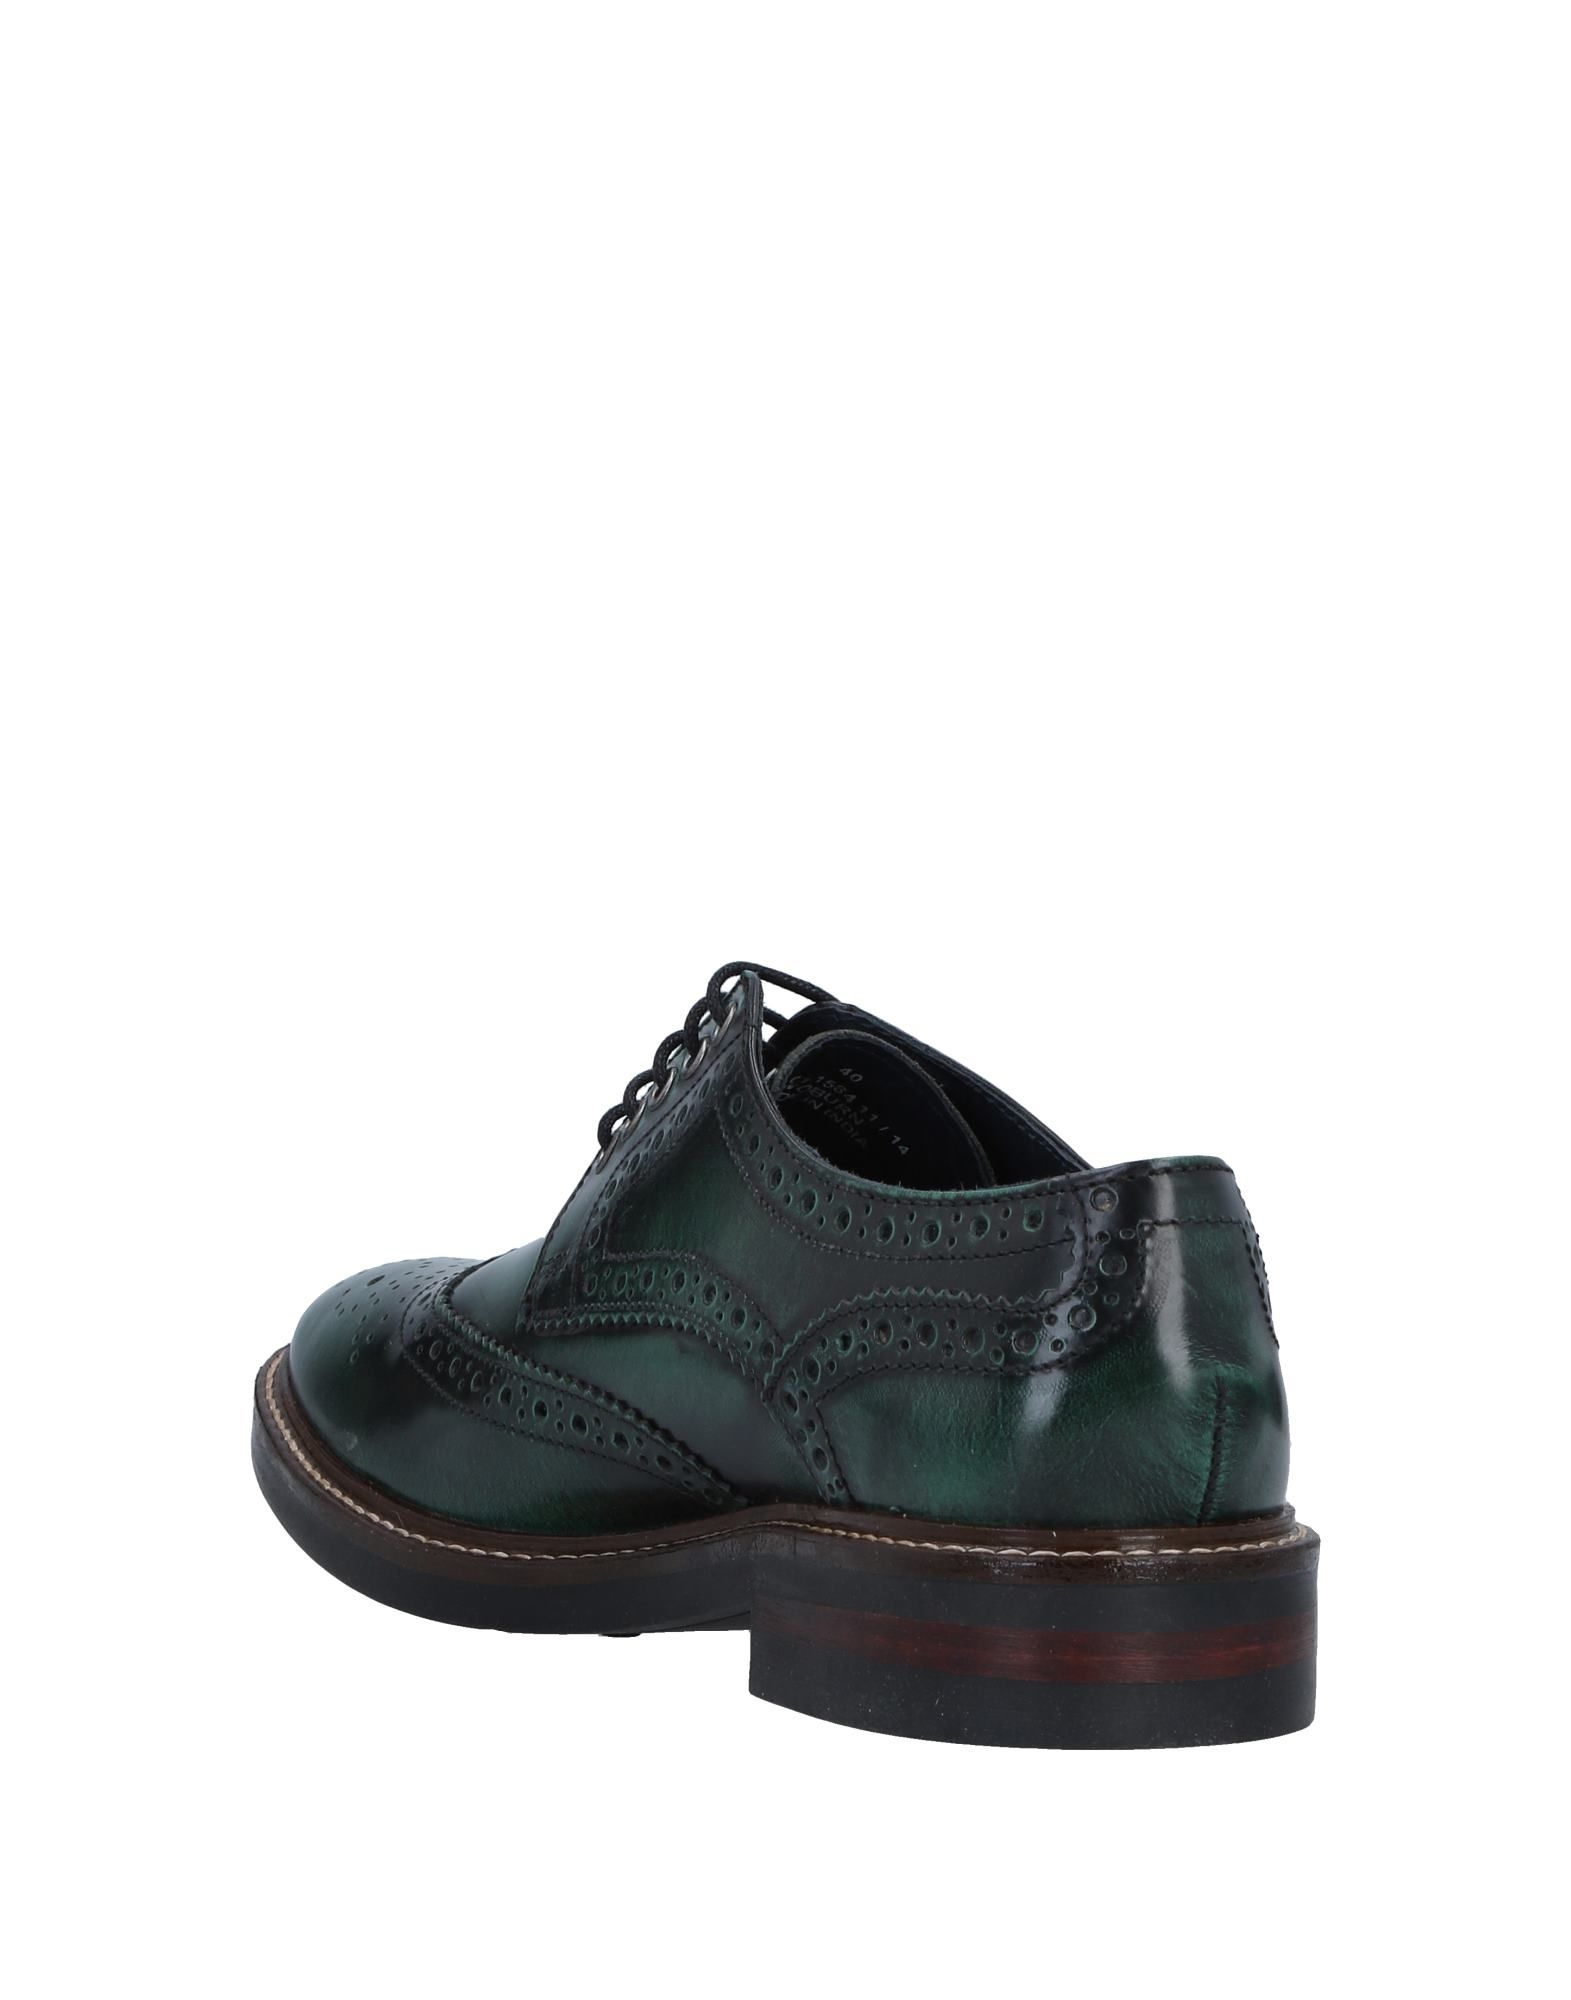 Rabatt London echte Schuhe Base  London Rabatt Schnürschuhe Herren  11533215NG 7ddd13